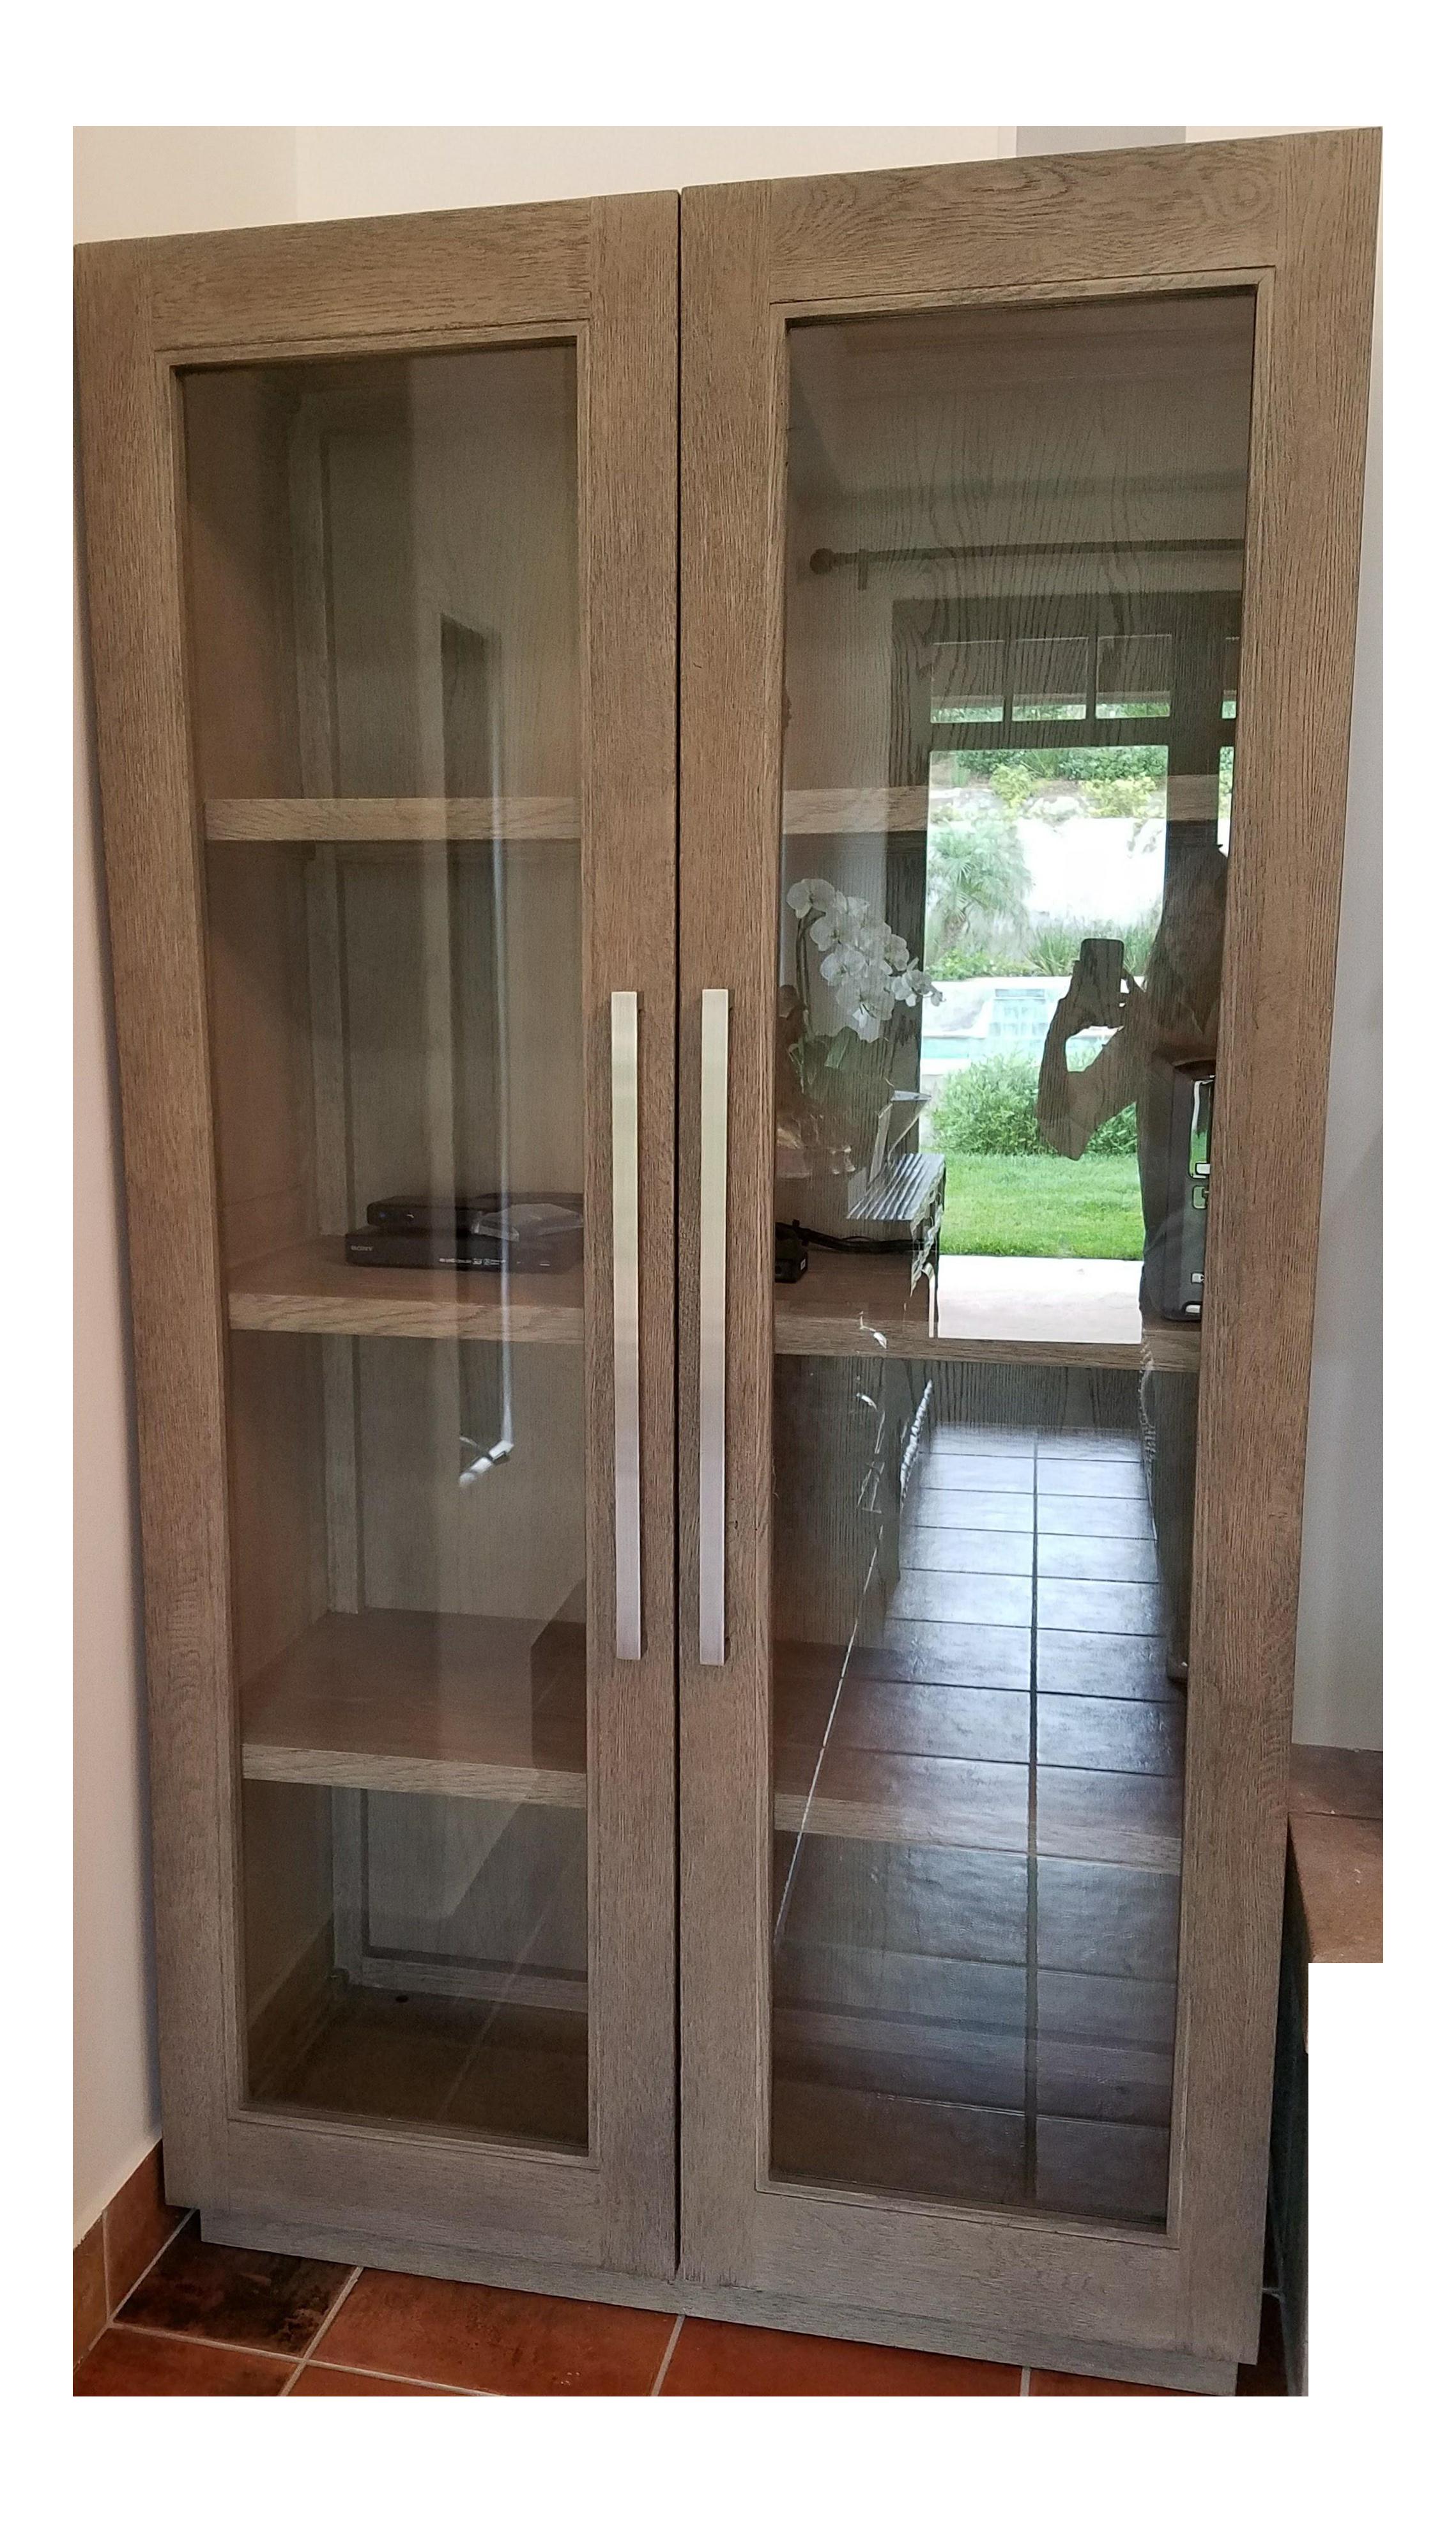 Restoration Hardware Grand Framed Glass Double-Door